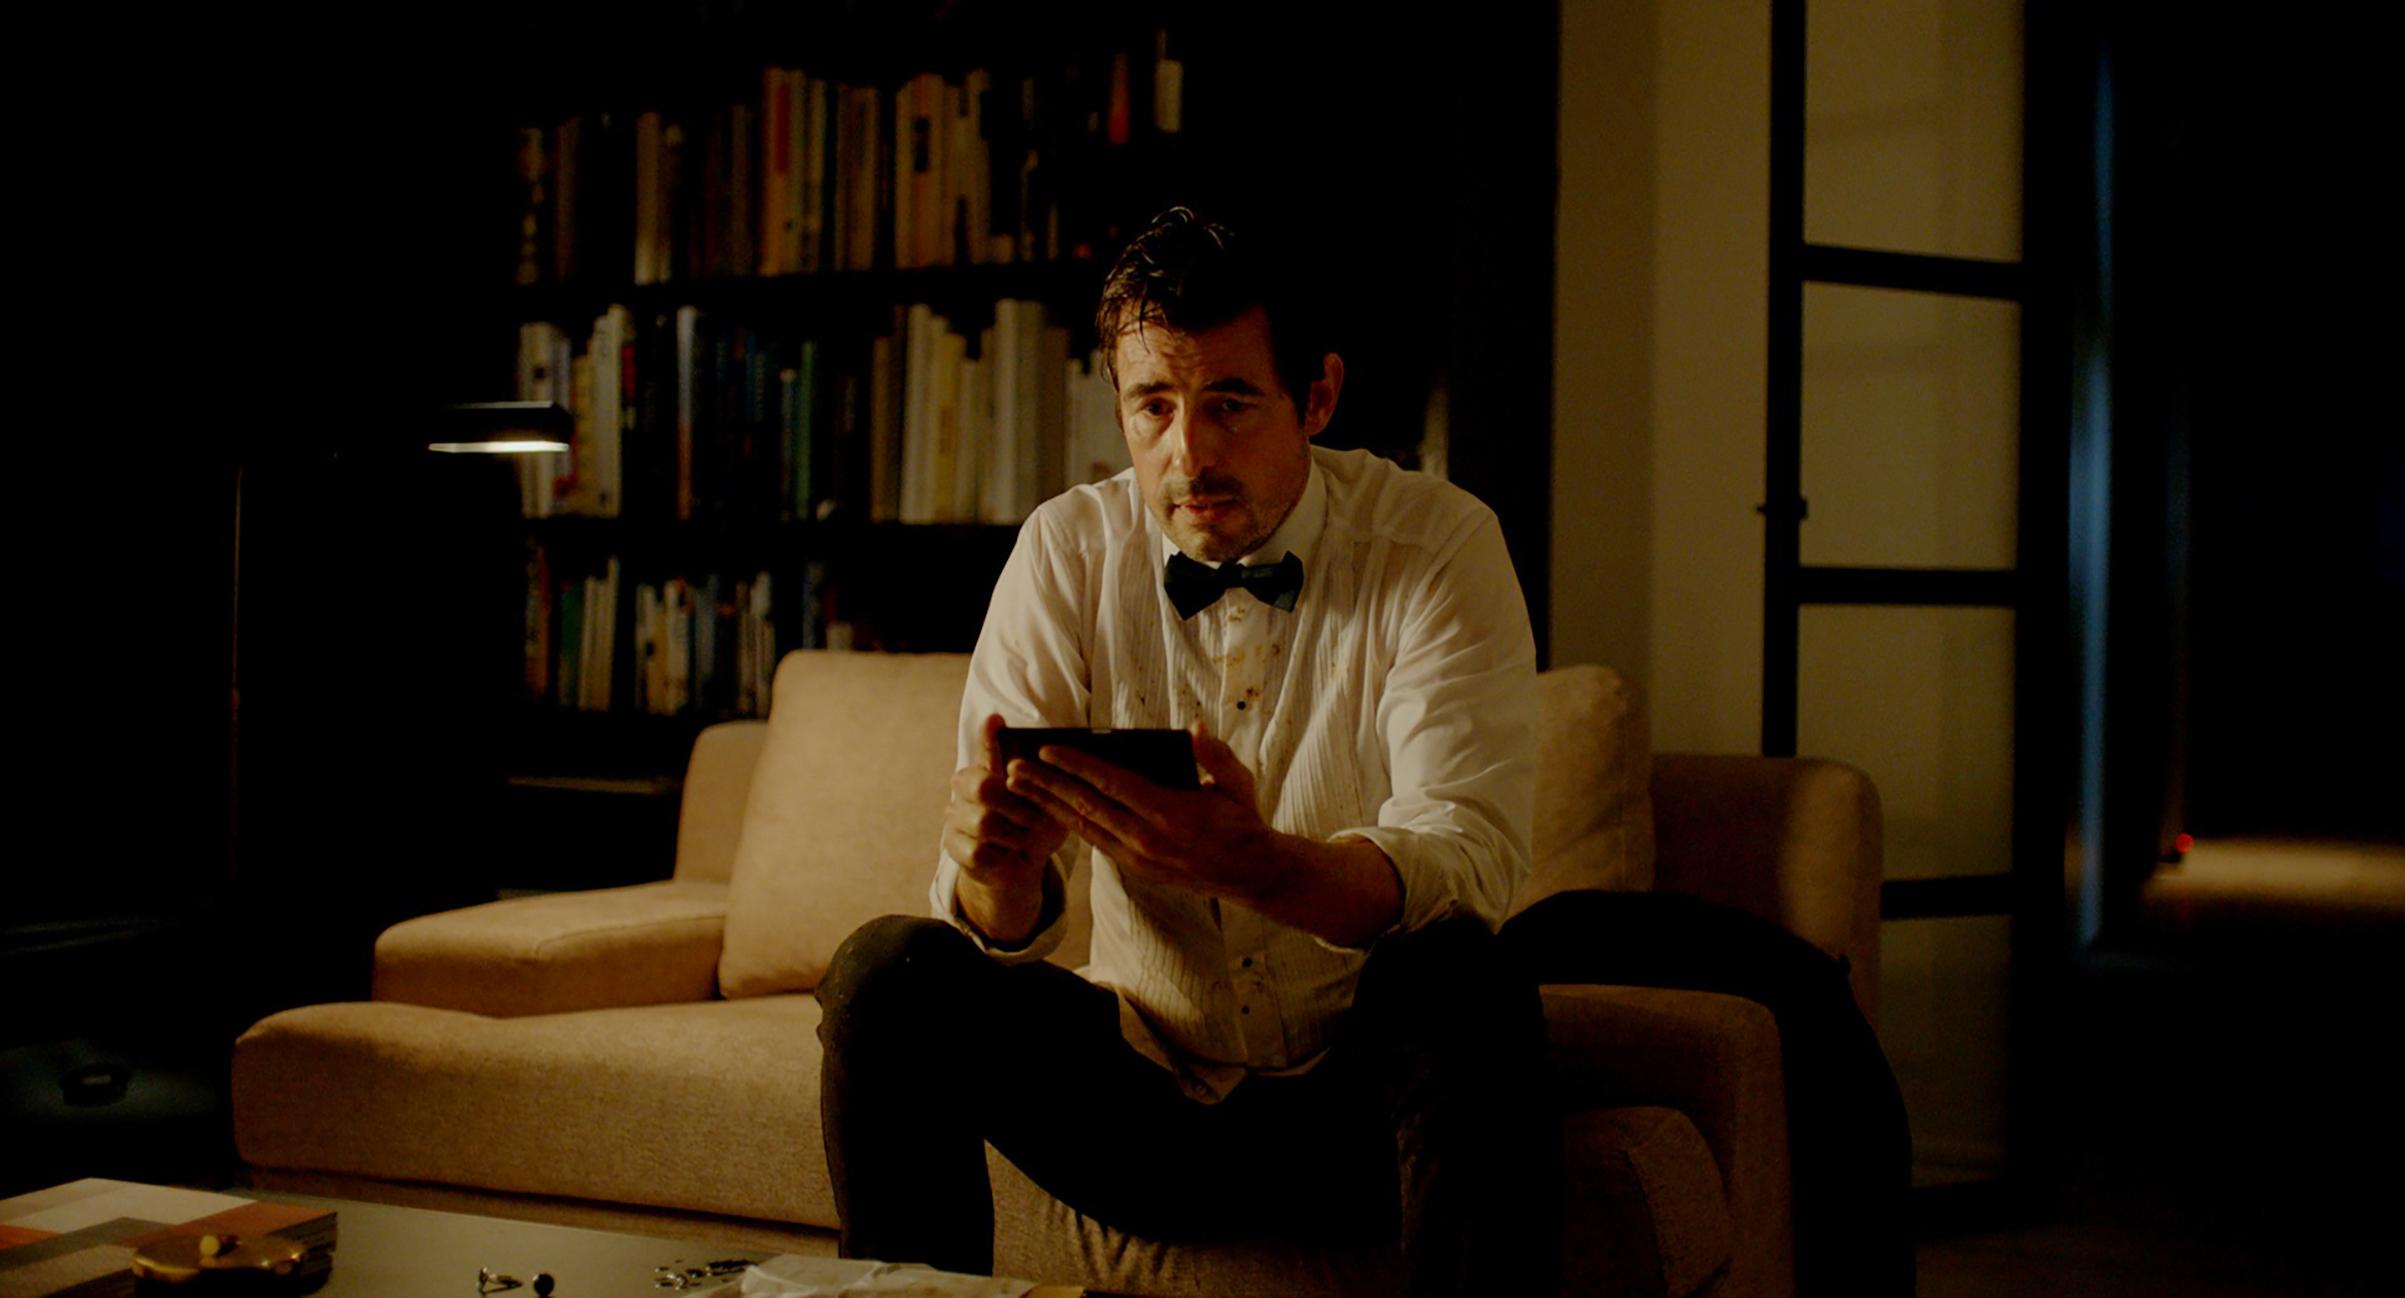 Bang in TheSquare: asdebonair as James Bond, but a lot more clueless